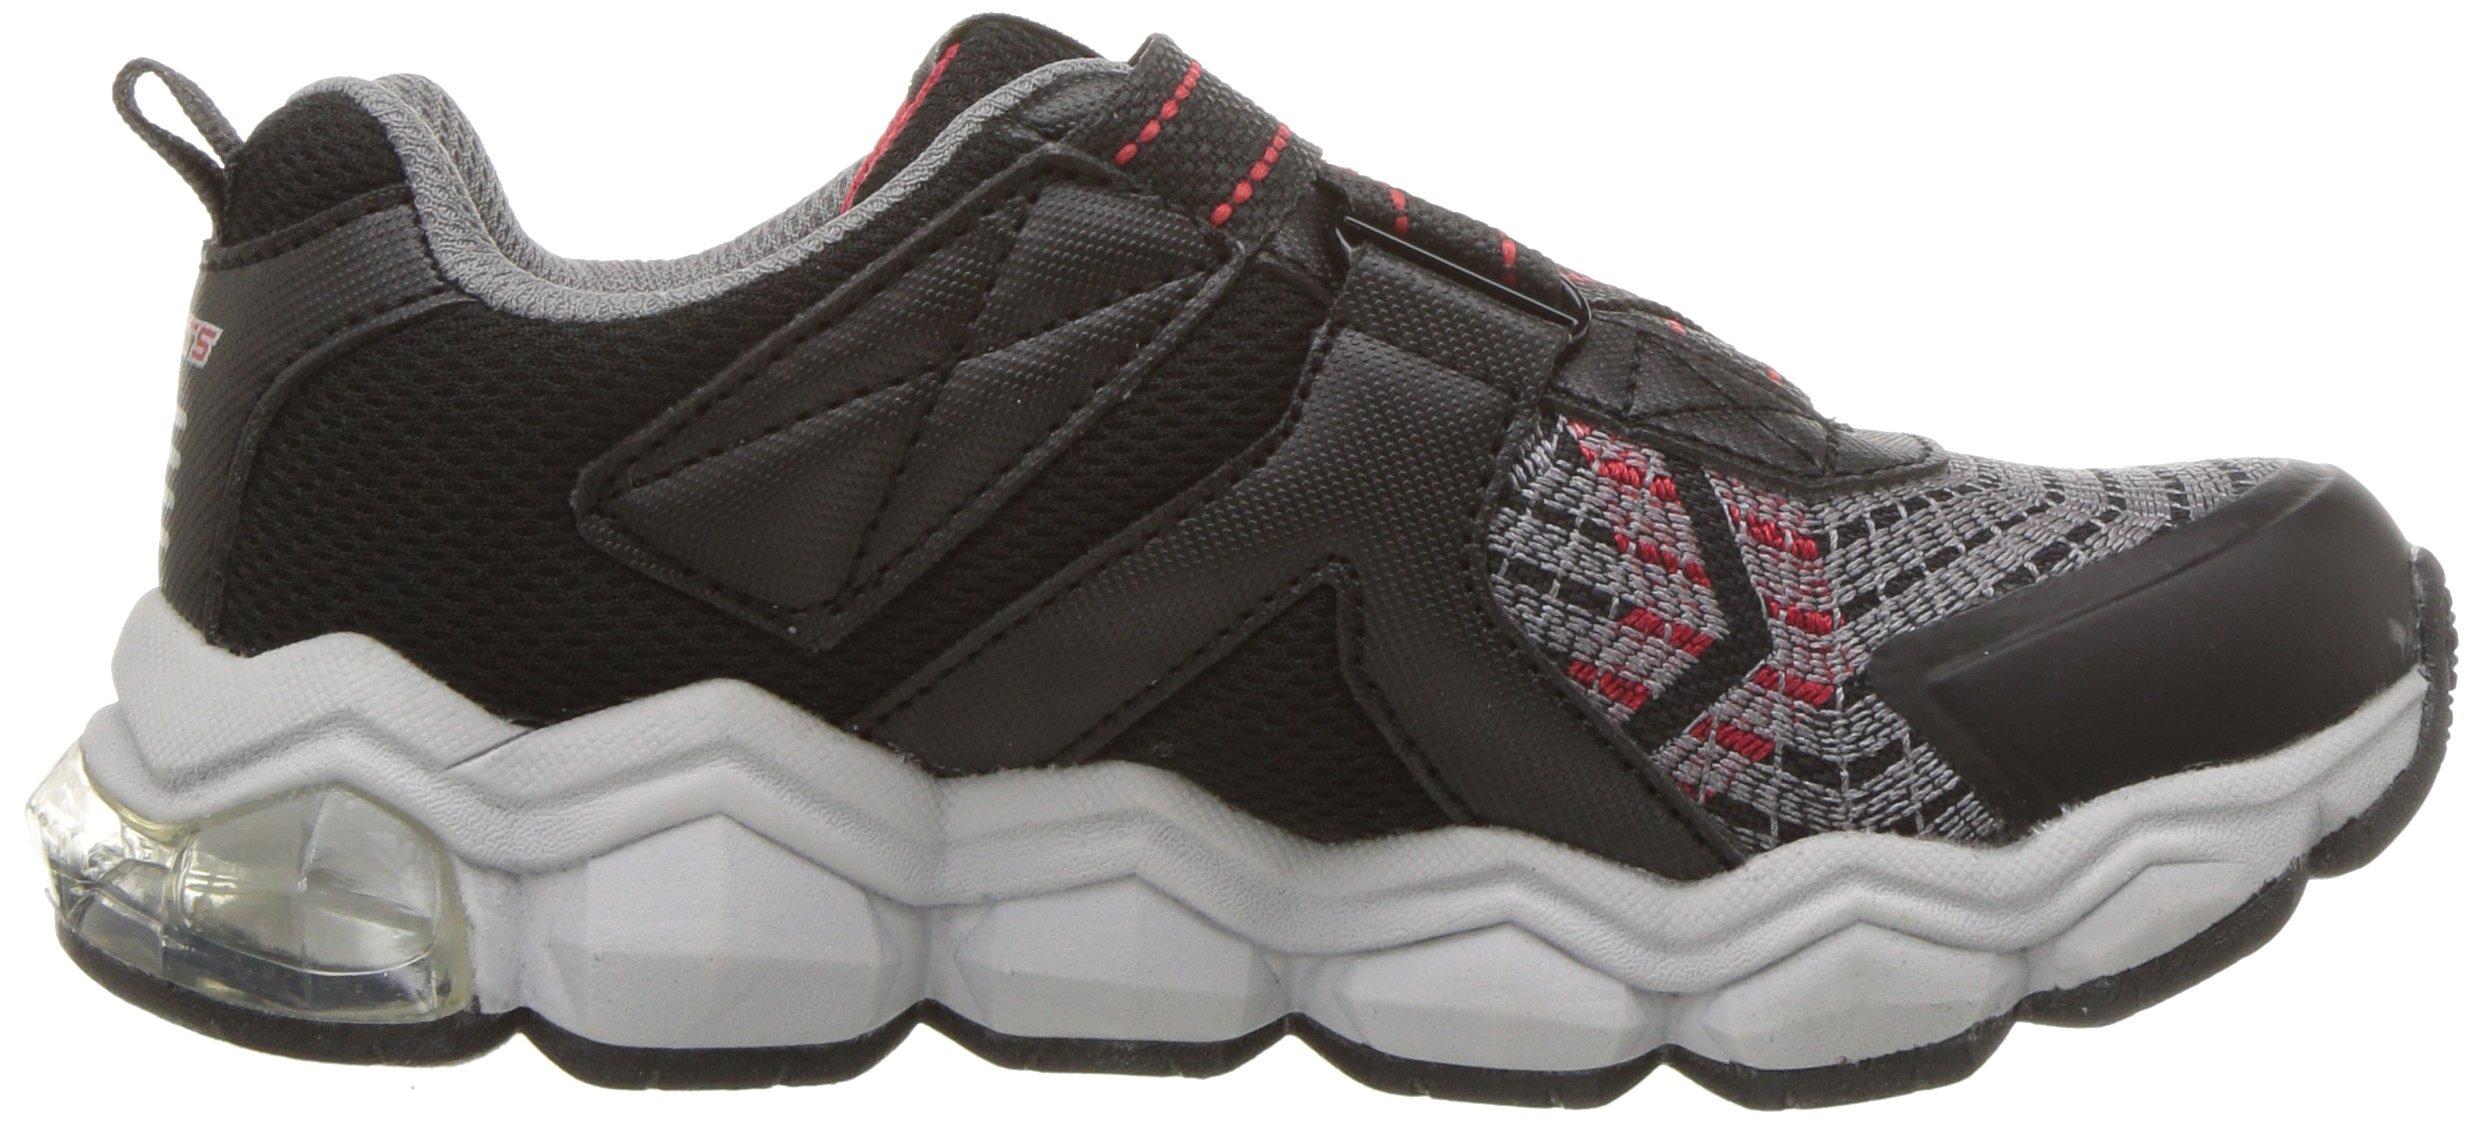 Skechers Kids Boys' Turbo-Flash-90596L Sneaker,Black/red,3 Medium US Little Kid by Skechers (Image #6)